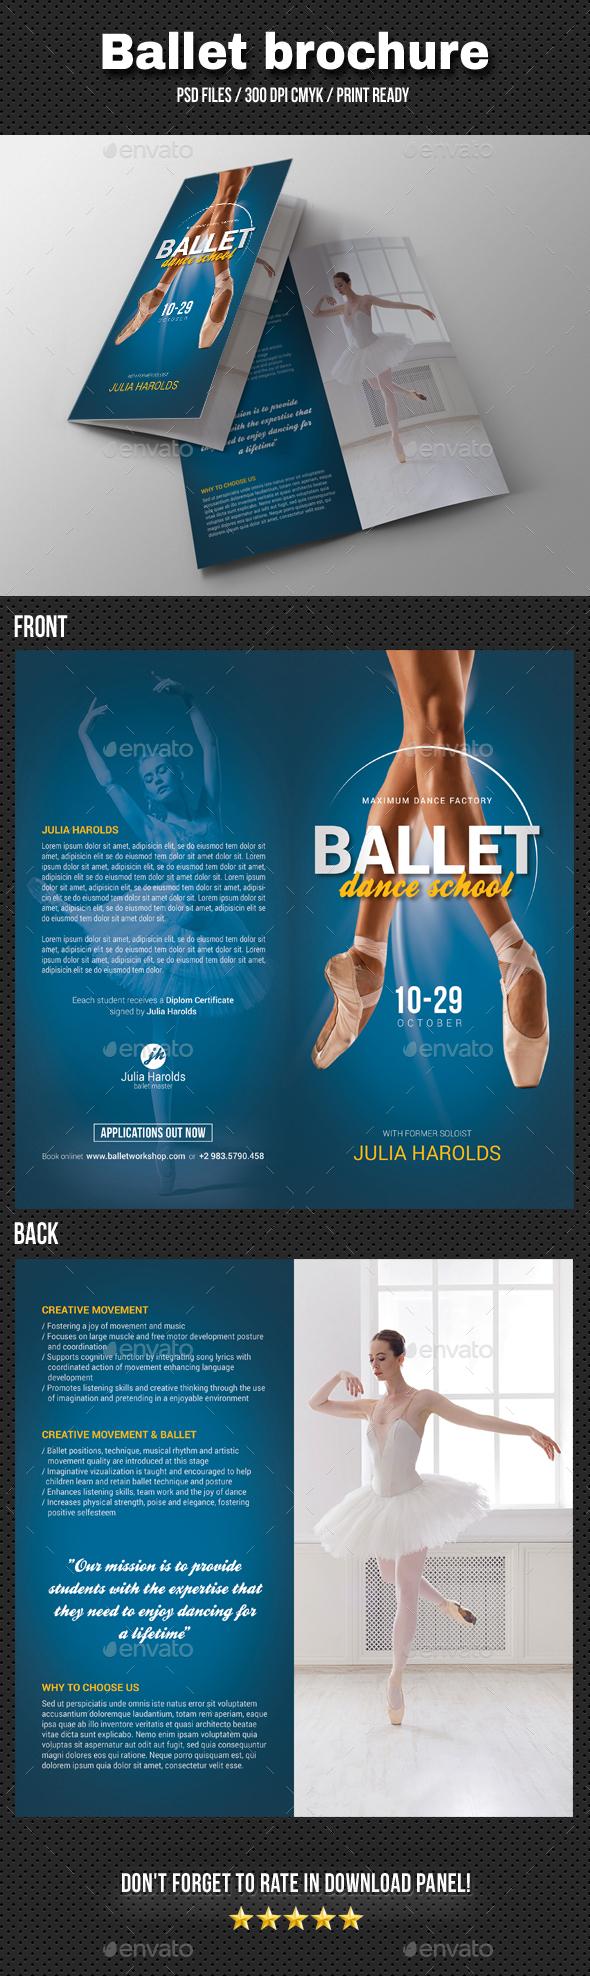 Ballet Workshop Bi-Fold Brochure - Brochures Print Templates